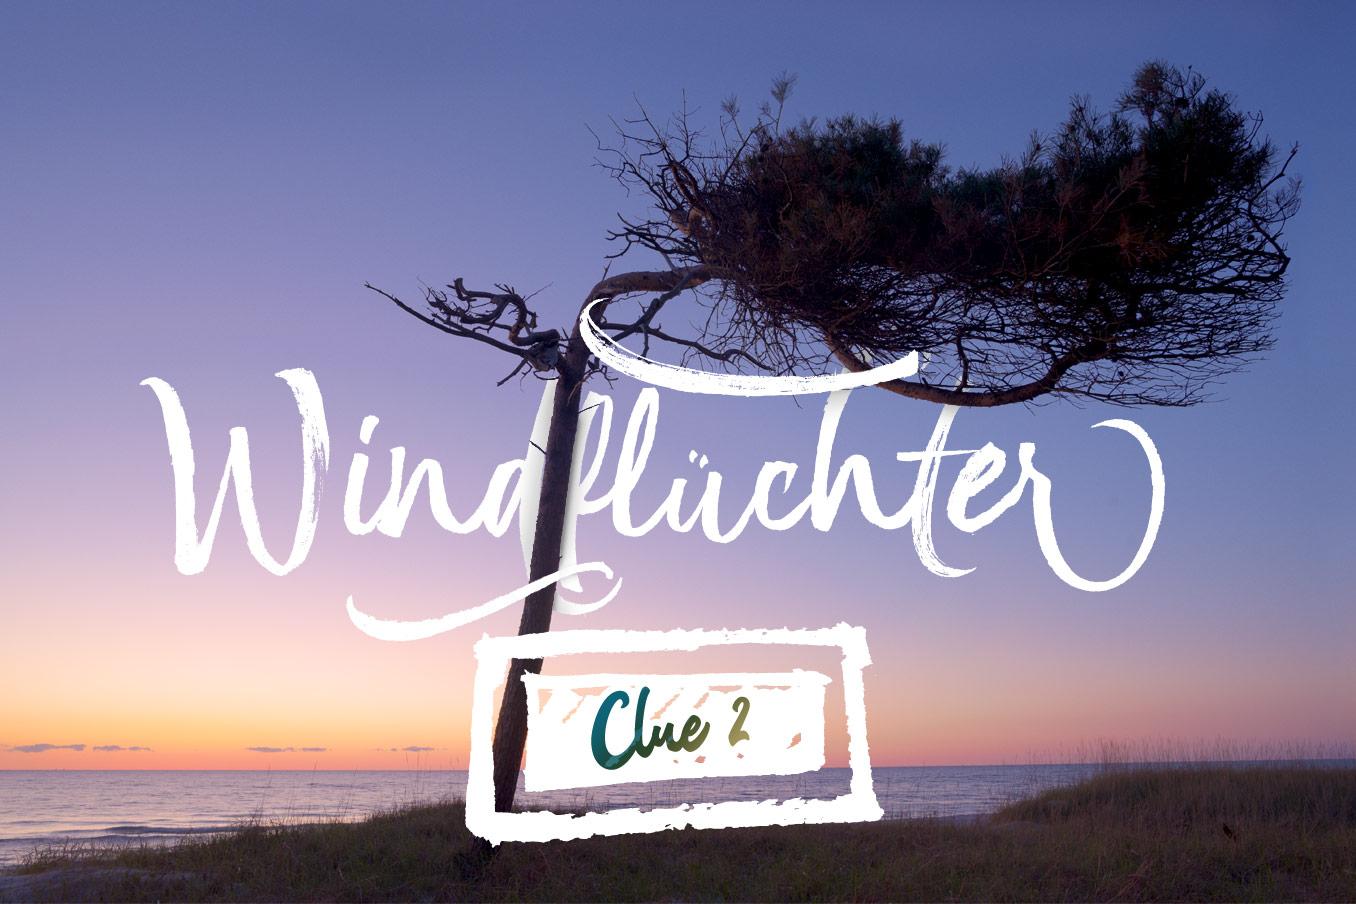 Windflüchter M-CAL Clue 2